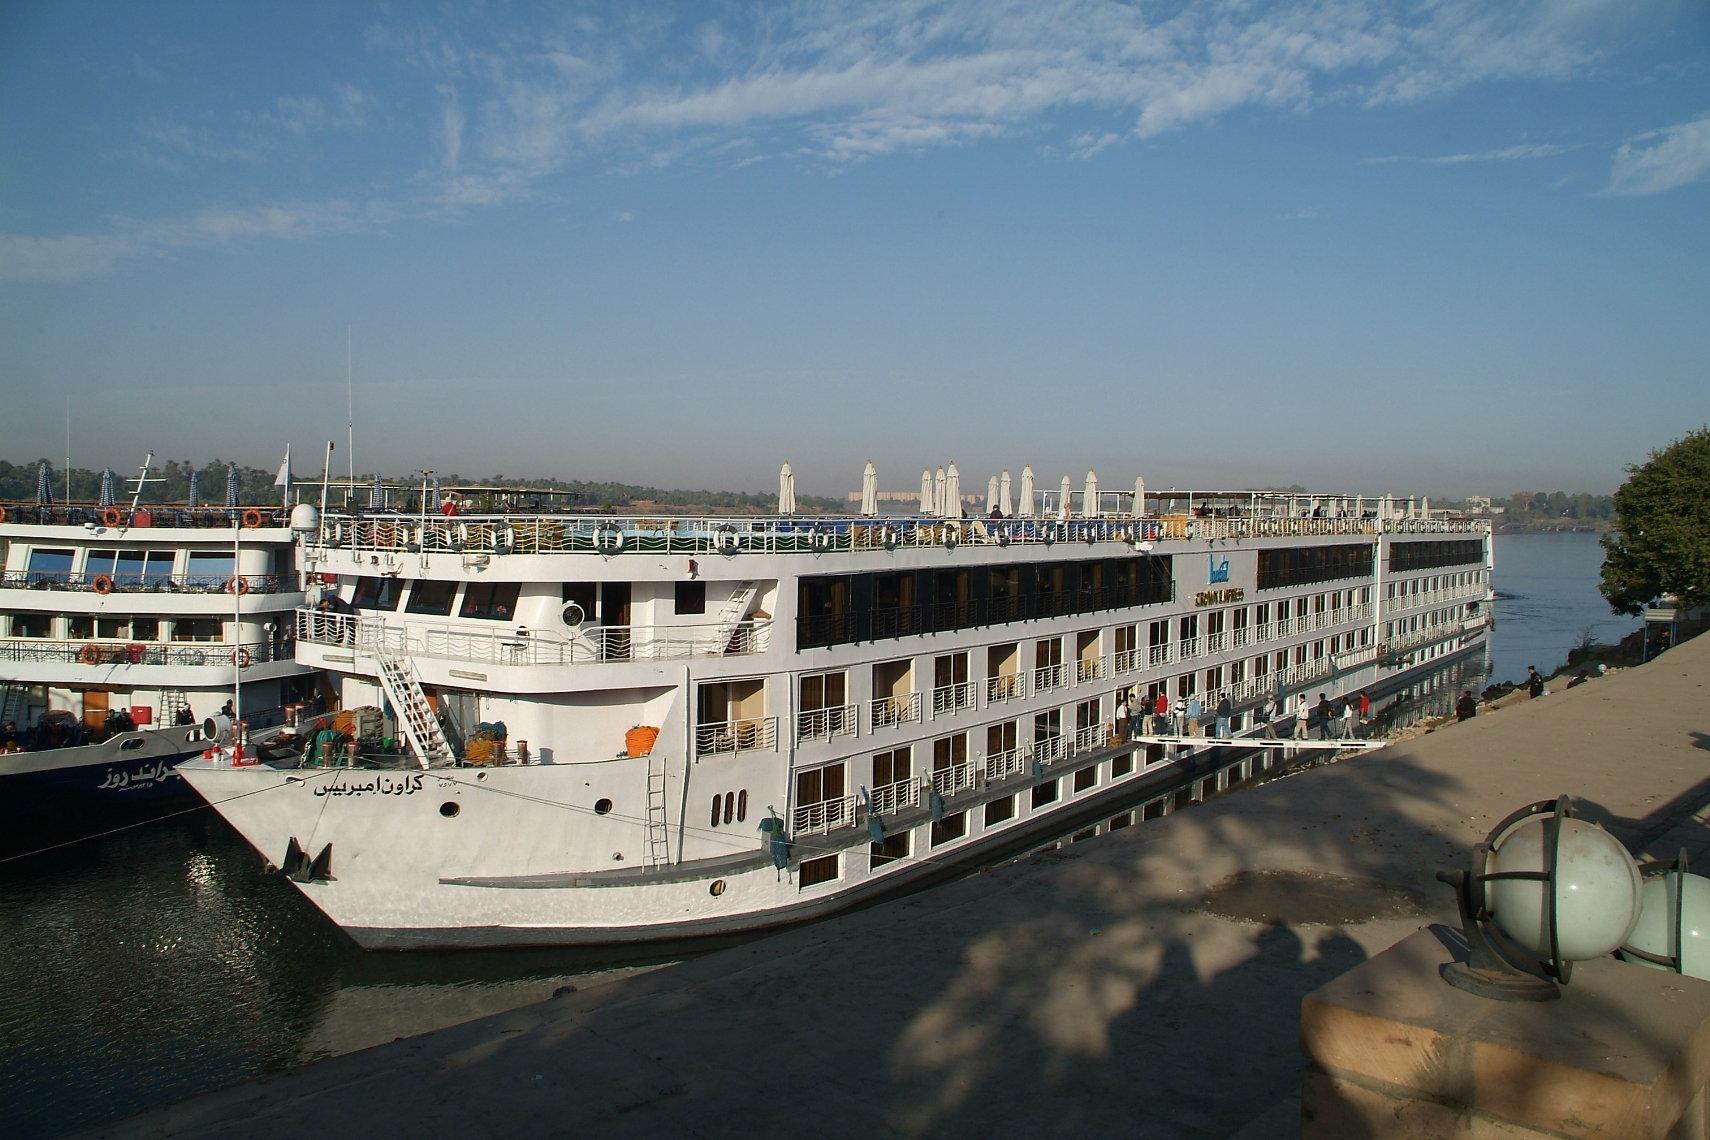 River Nile Cruise Ship.jpg